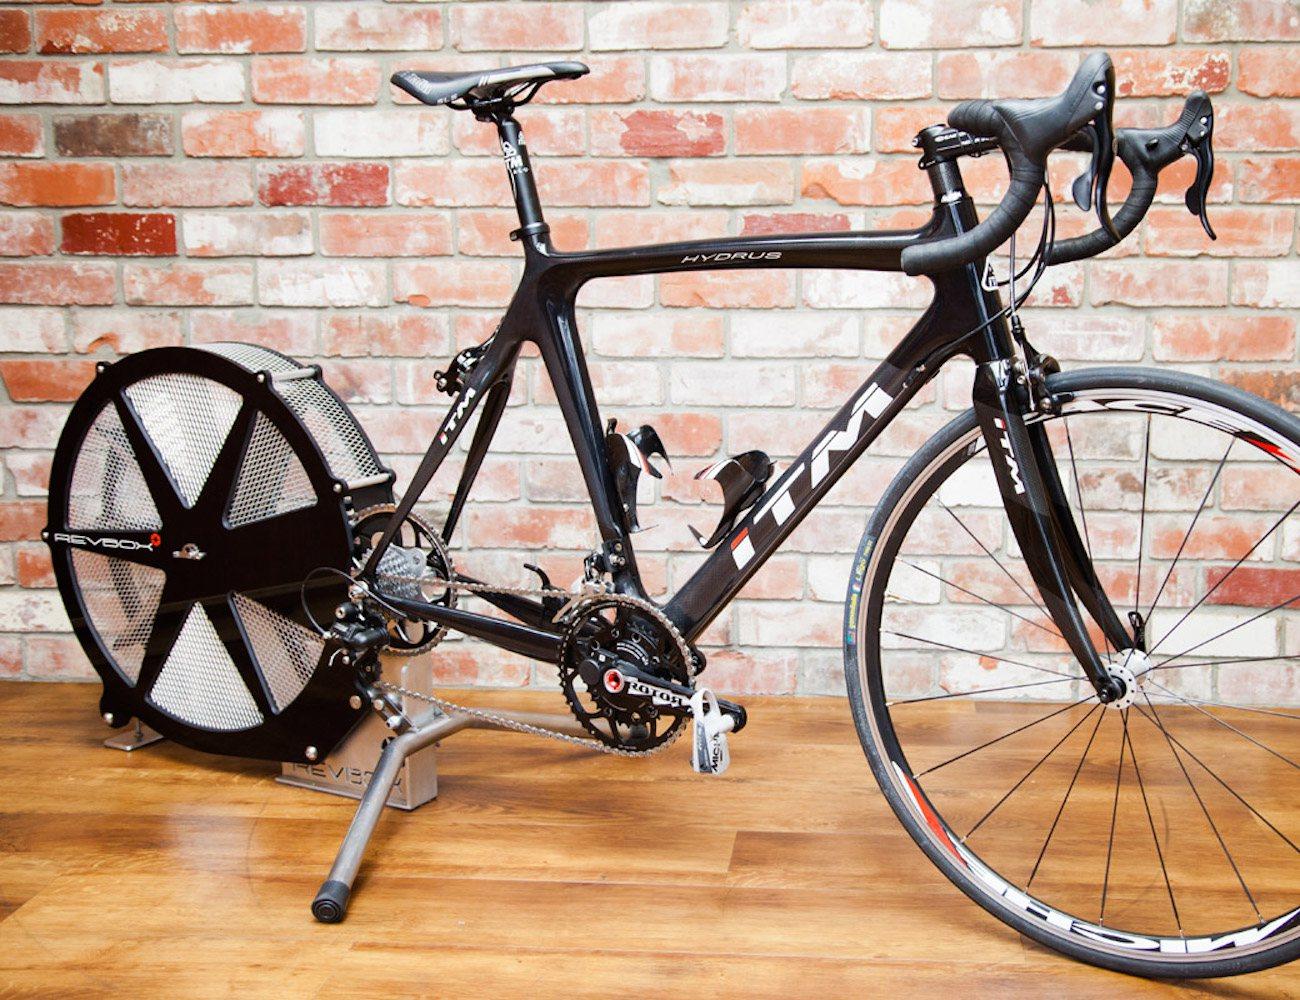 Revbox Erg – Revolutionary Stationary Cycle Trainer